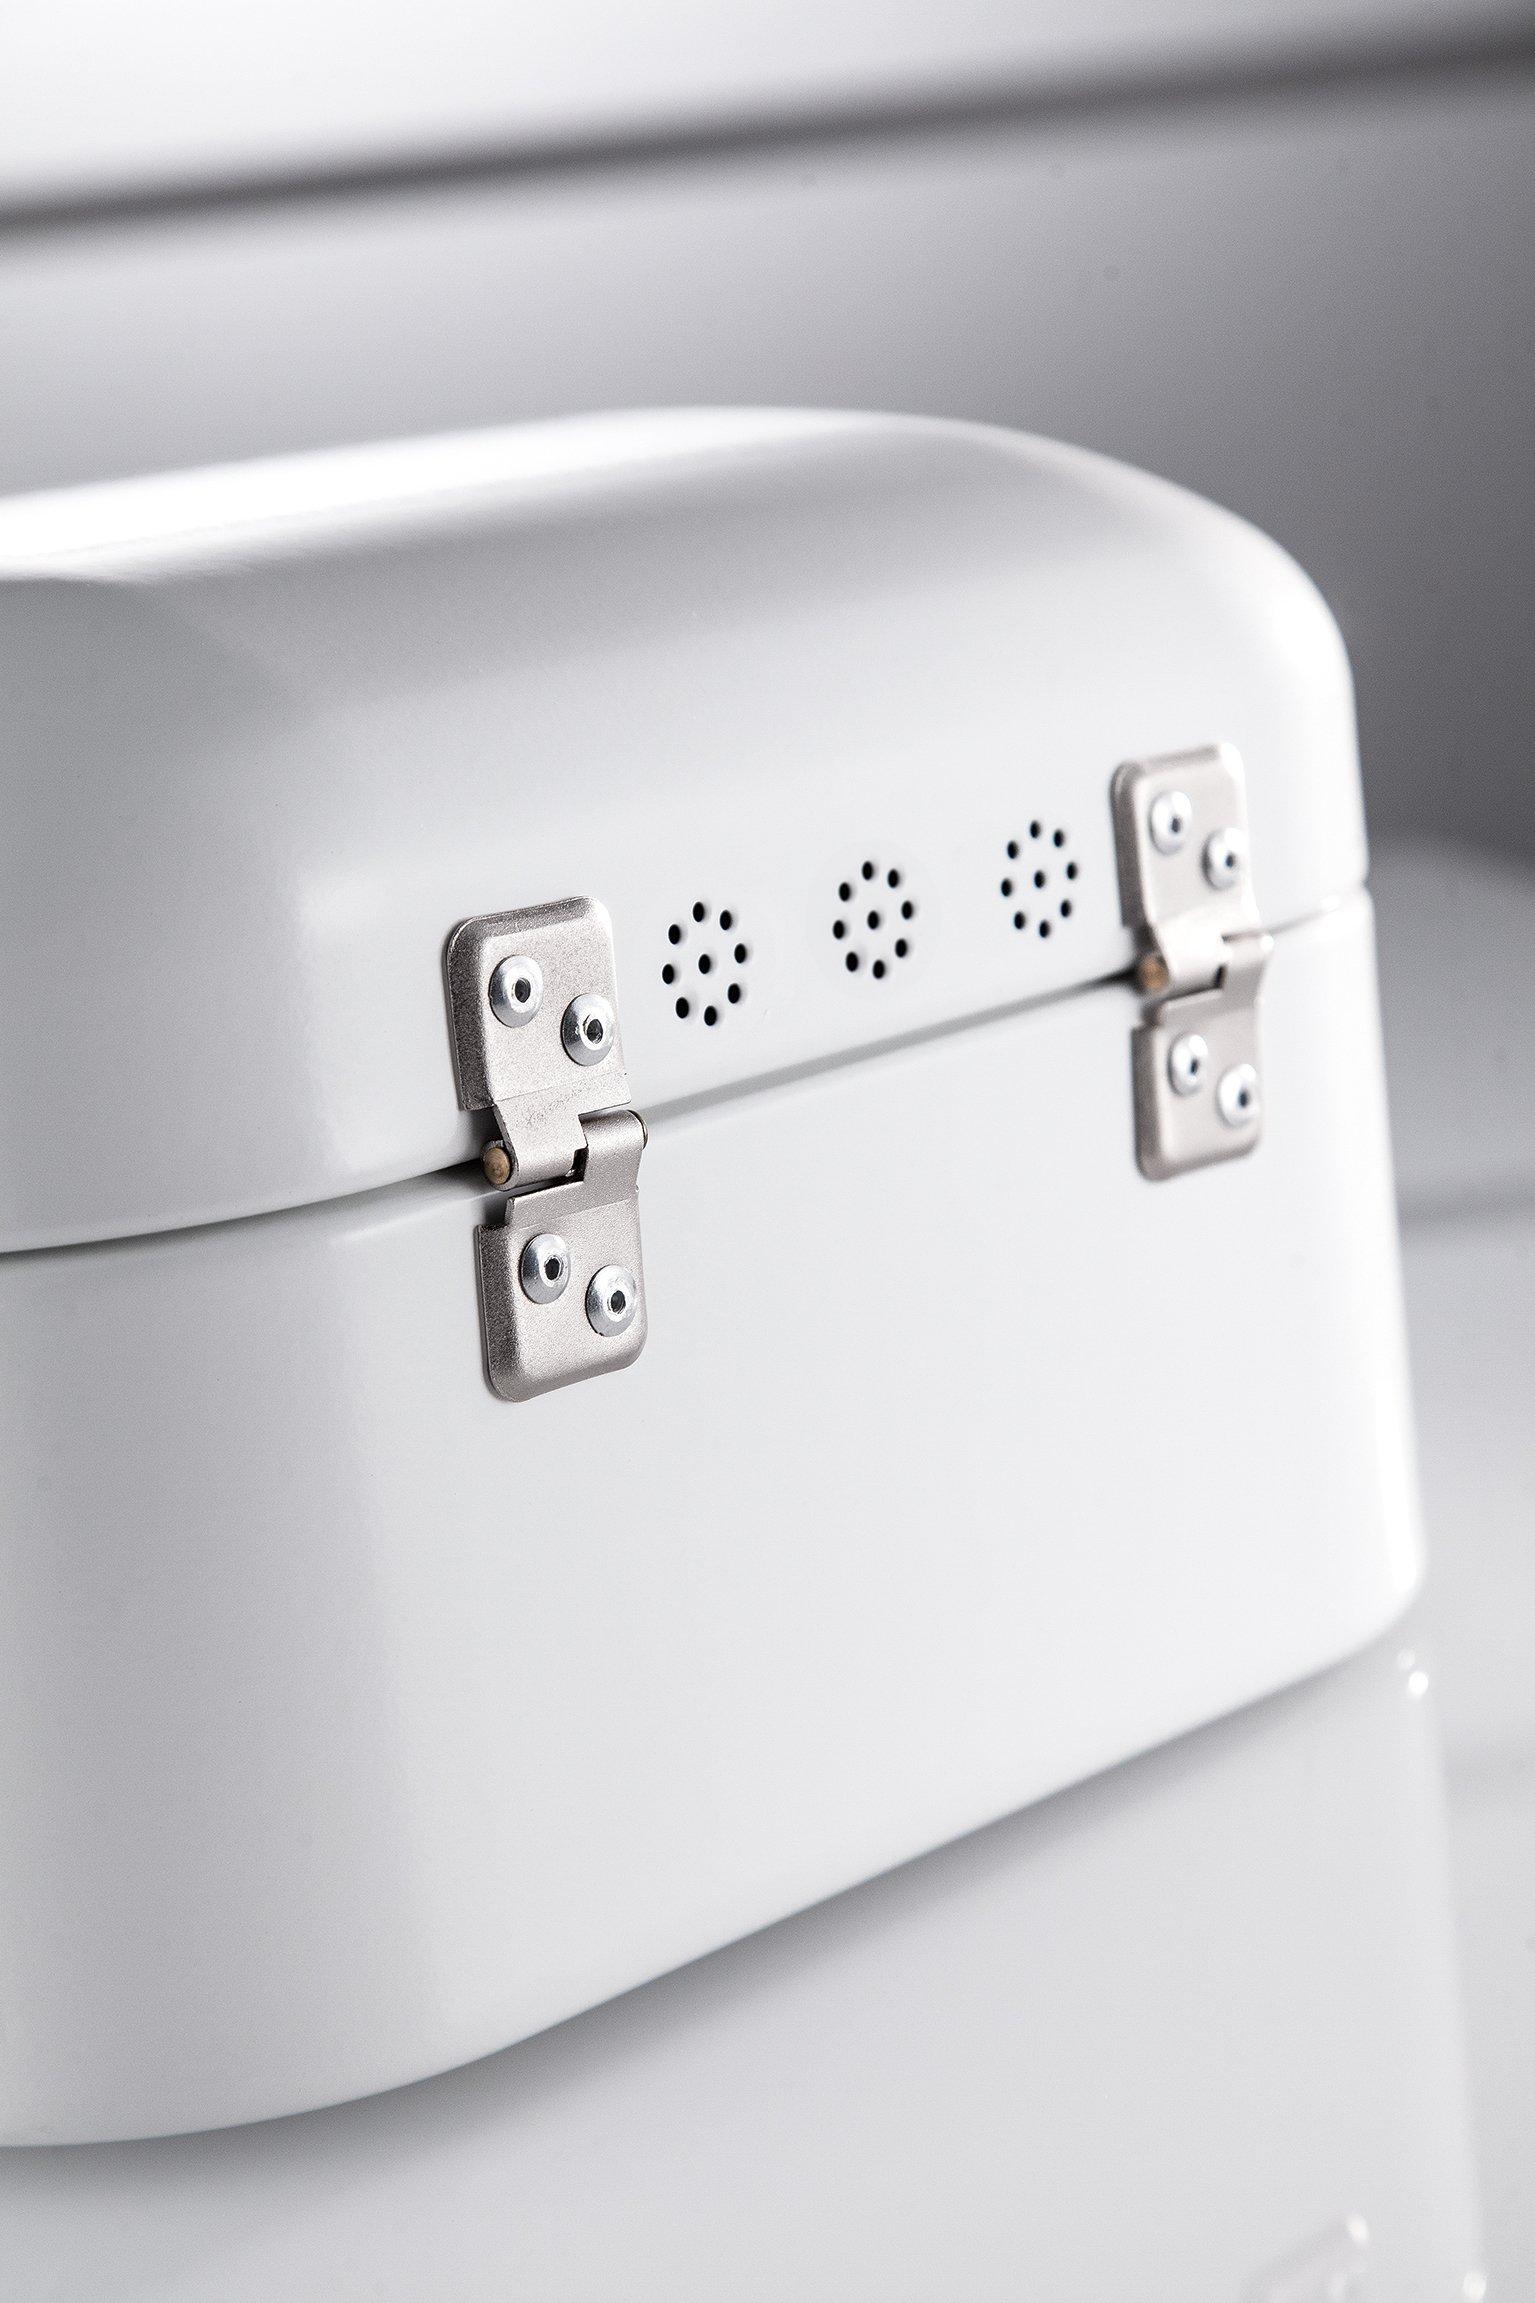 Wesco Single Grandy – German Designed - Steel bread box for kitchen / storage container, White